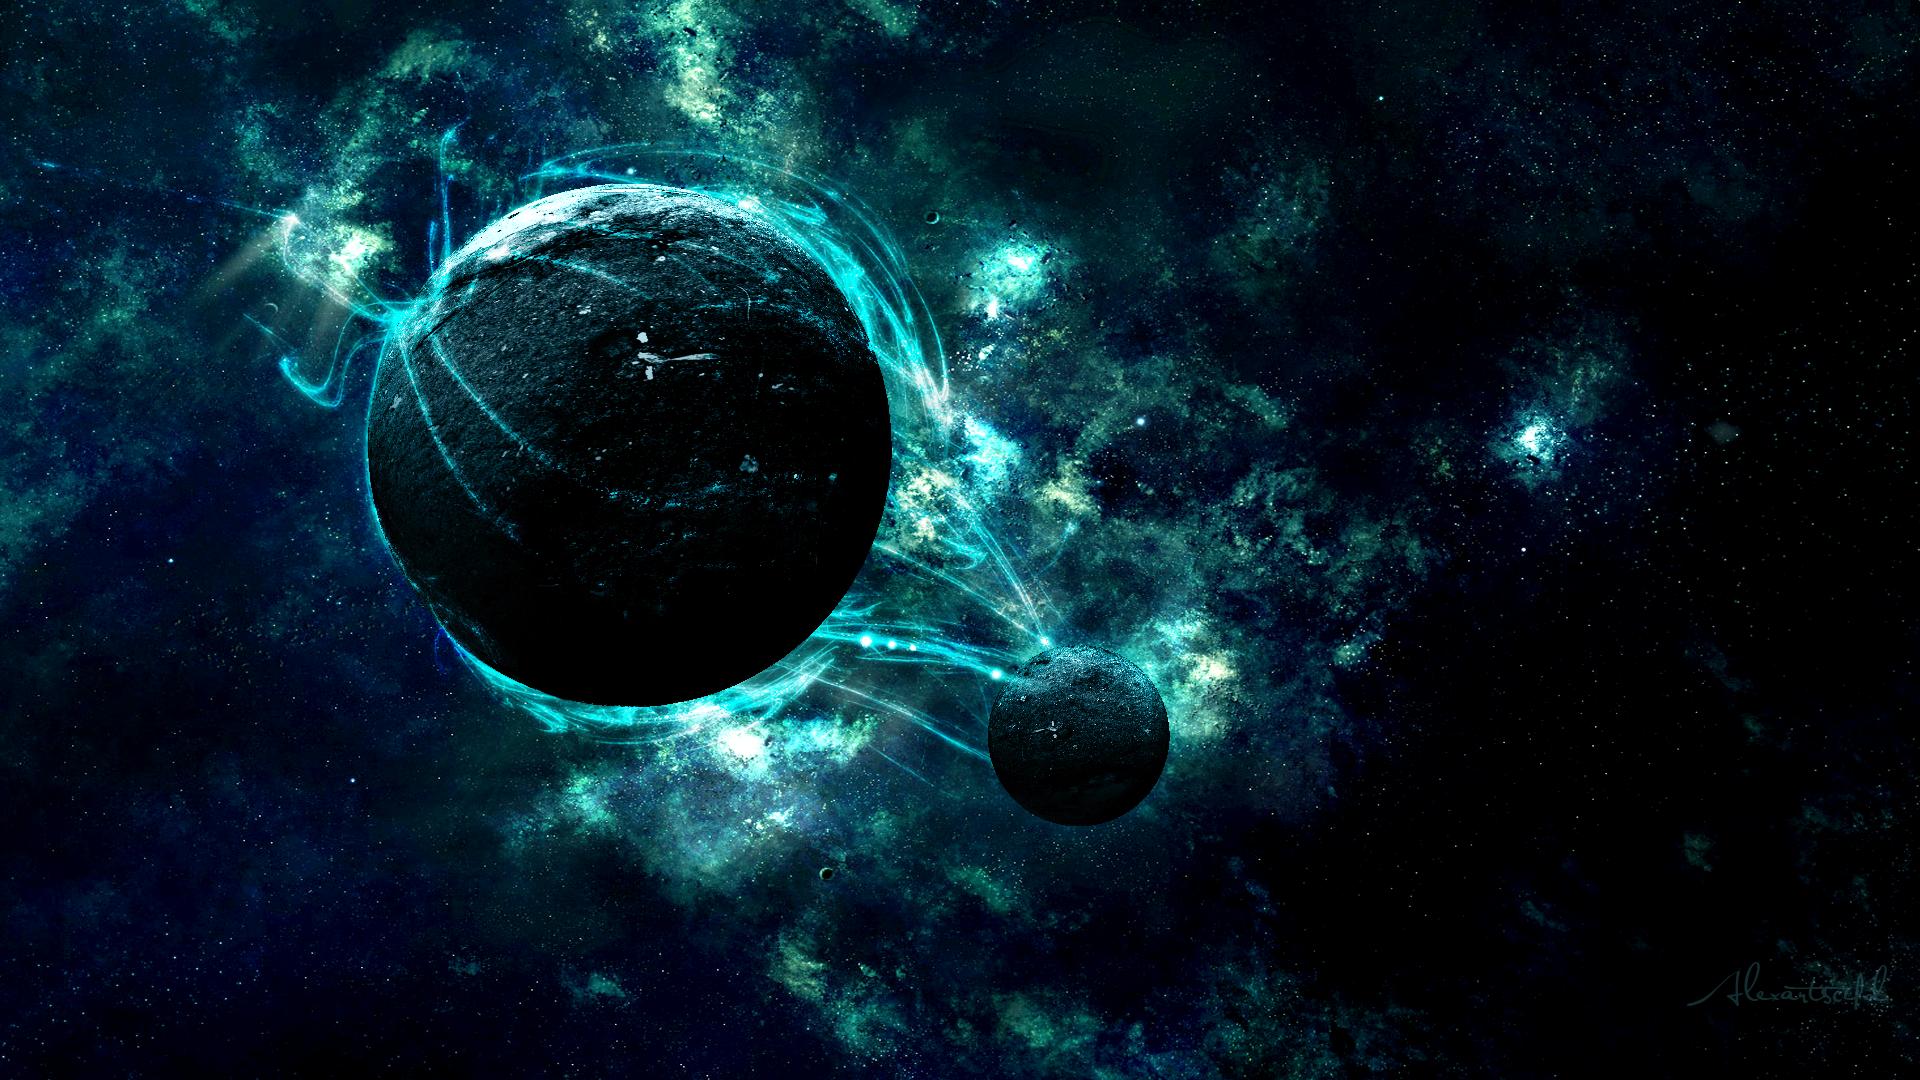 planet nebula wallpaper by alexartsc4d customization wallpaper mac pc 1920x1080